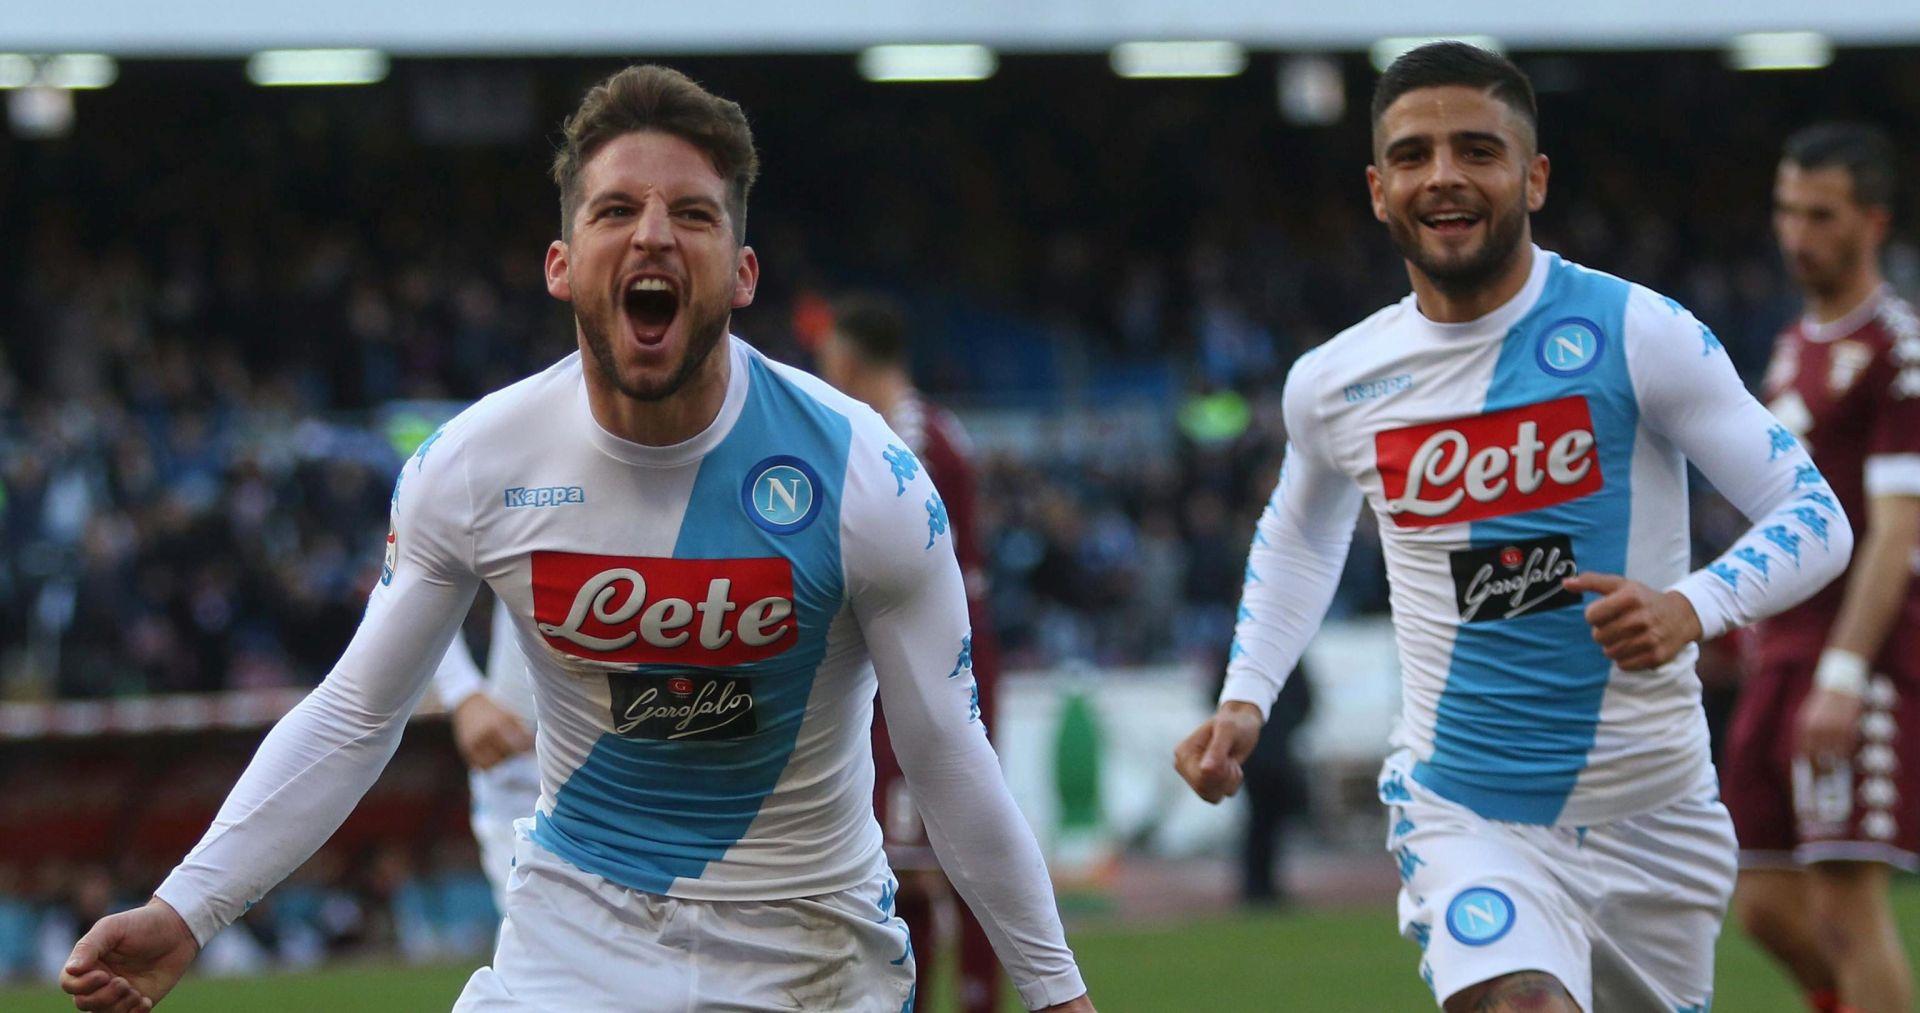 VIDEO: SERIE A Četiri gola Mertensa u slavlju Napolija nad Torinom